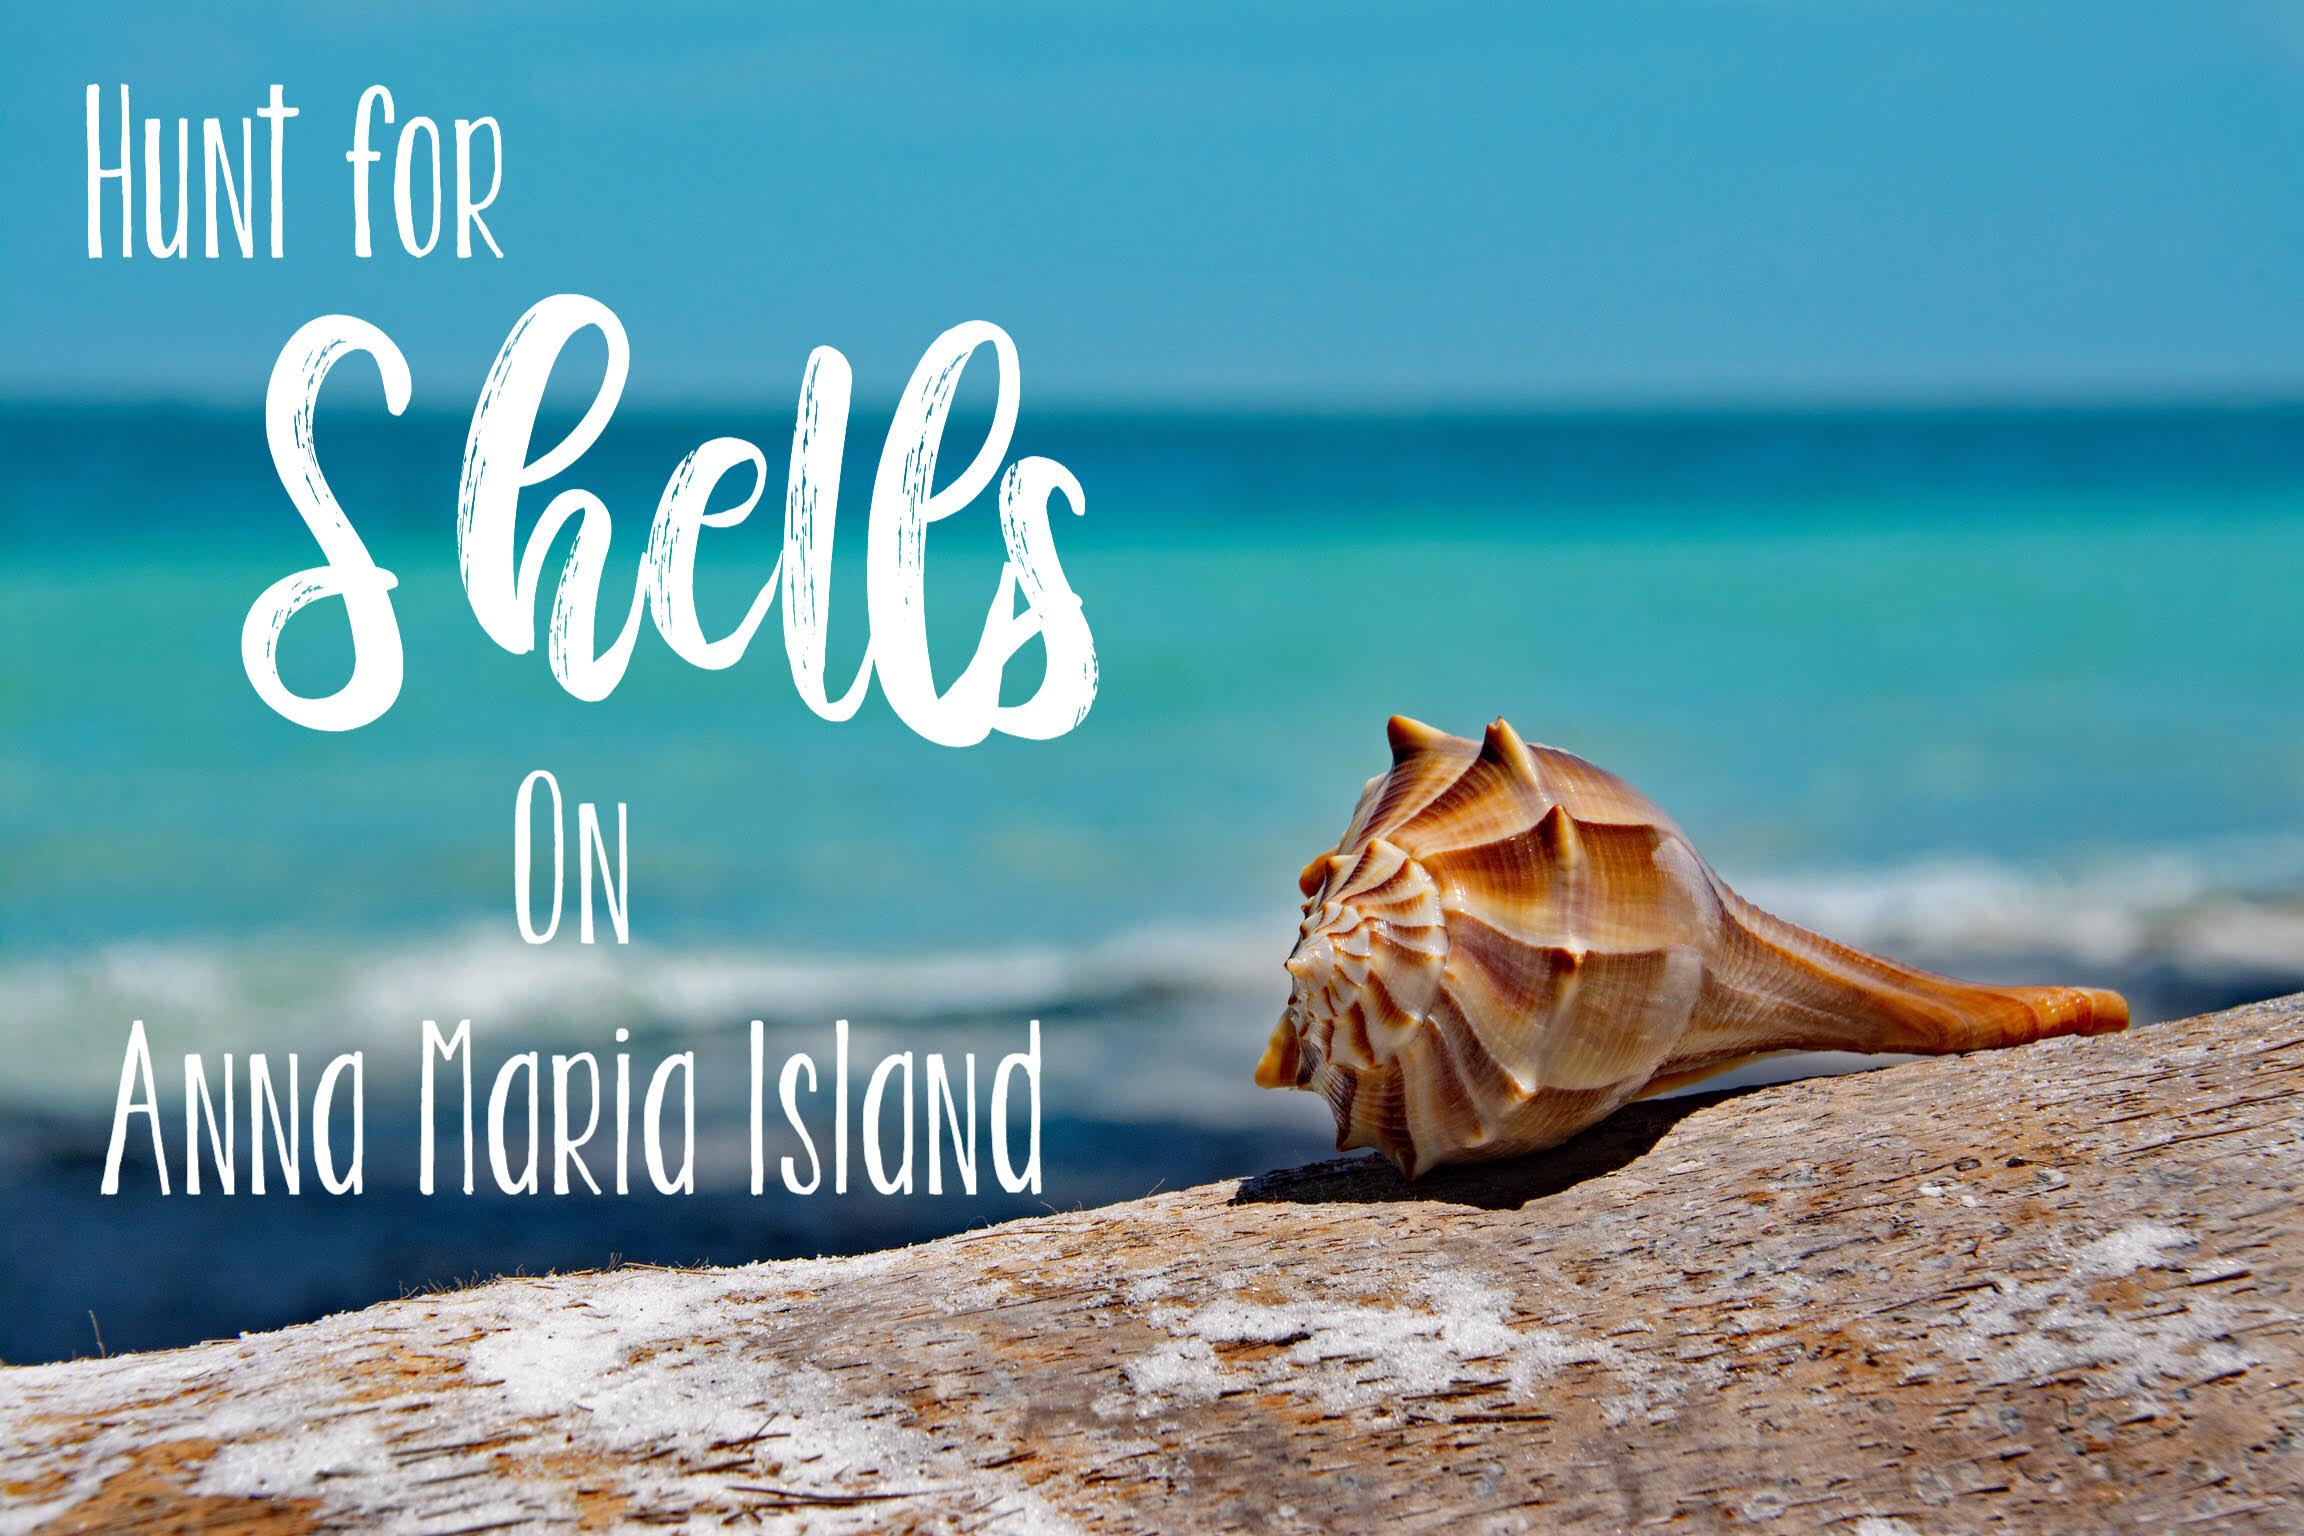 Hunt for Shells on Anna Maria Island